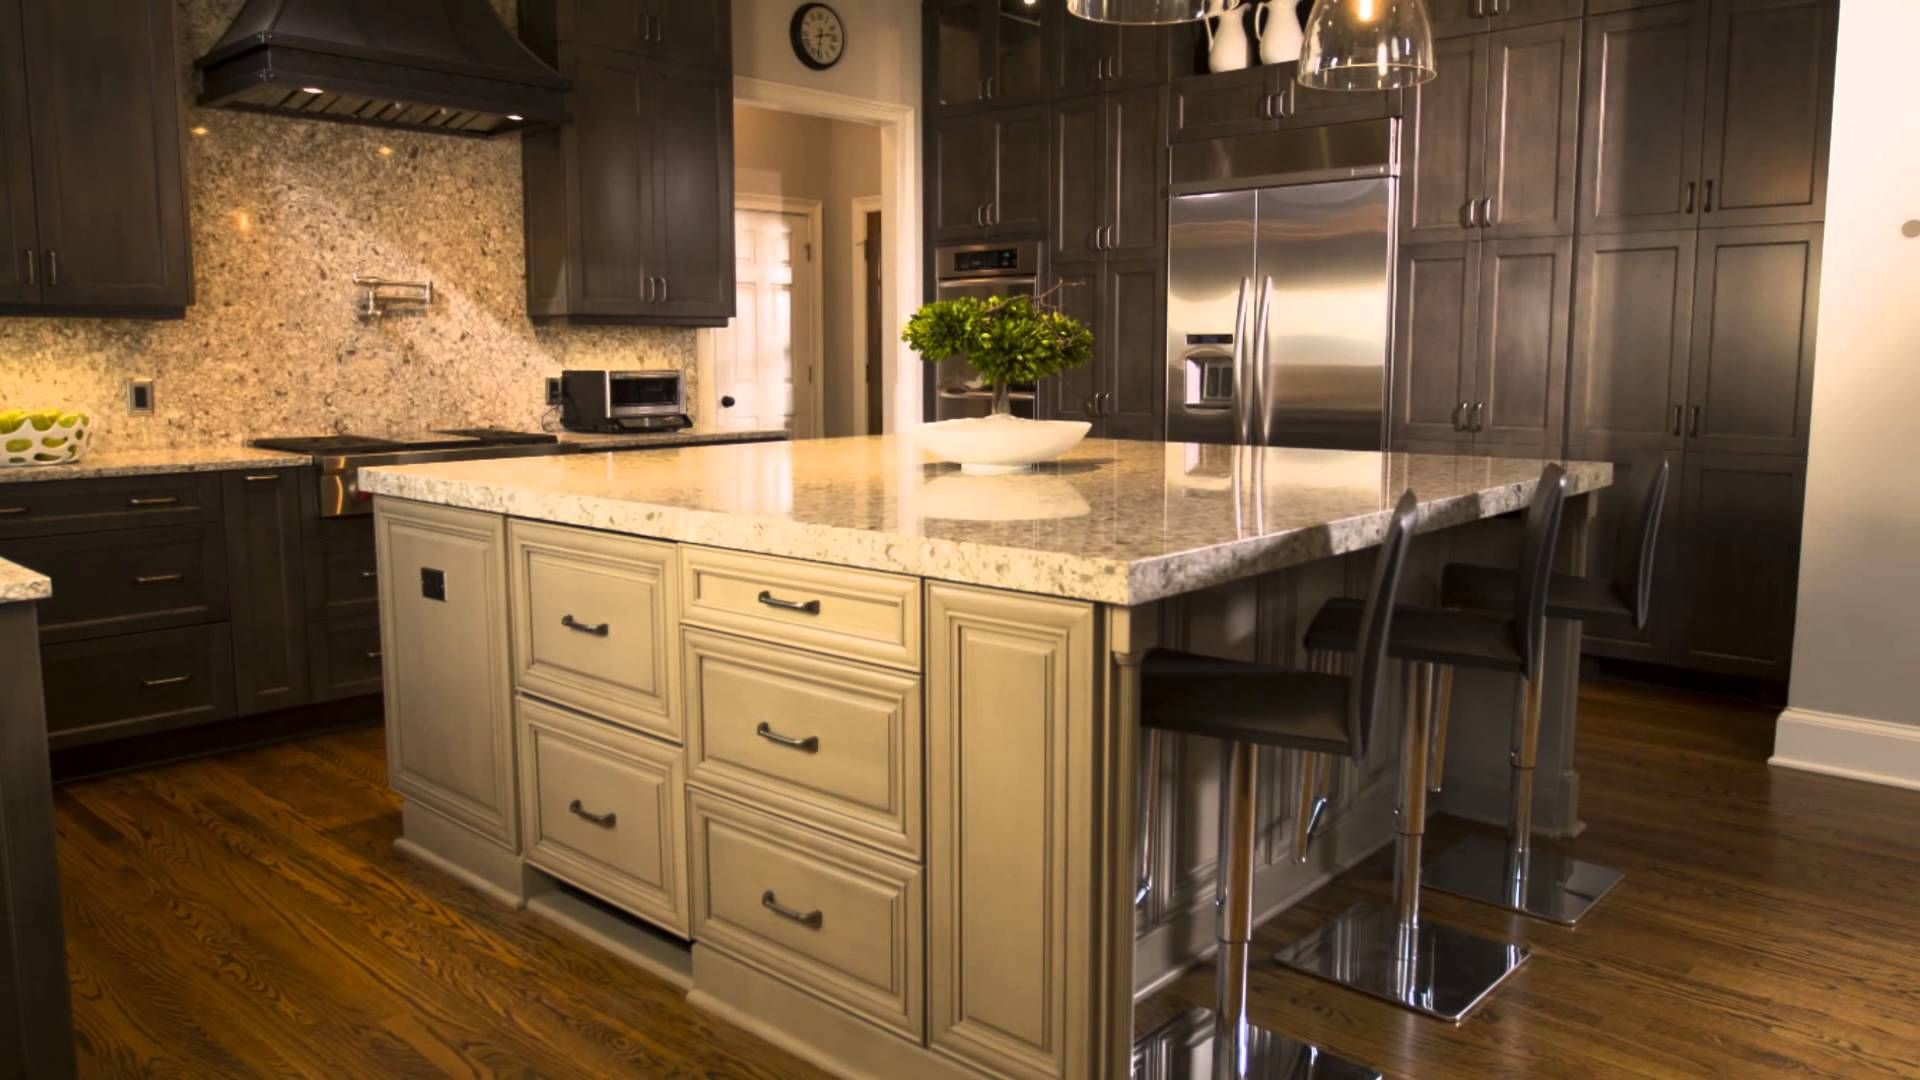 Kraftmaid Kitchens. Kraftmaid Cabinets Reviews Kitchen With ...